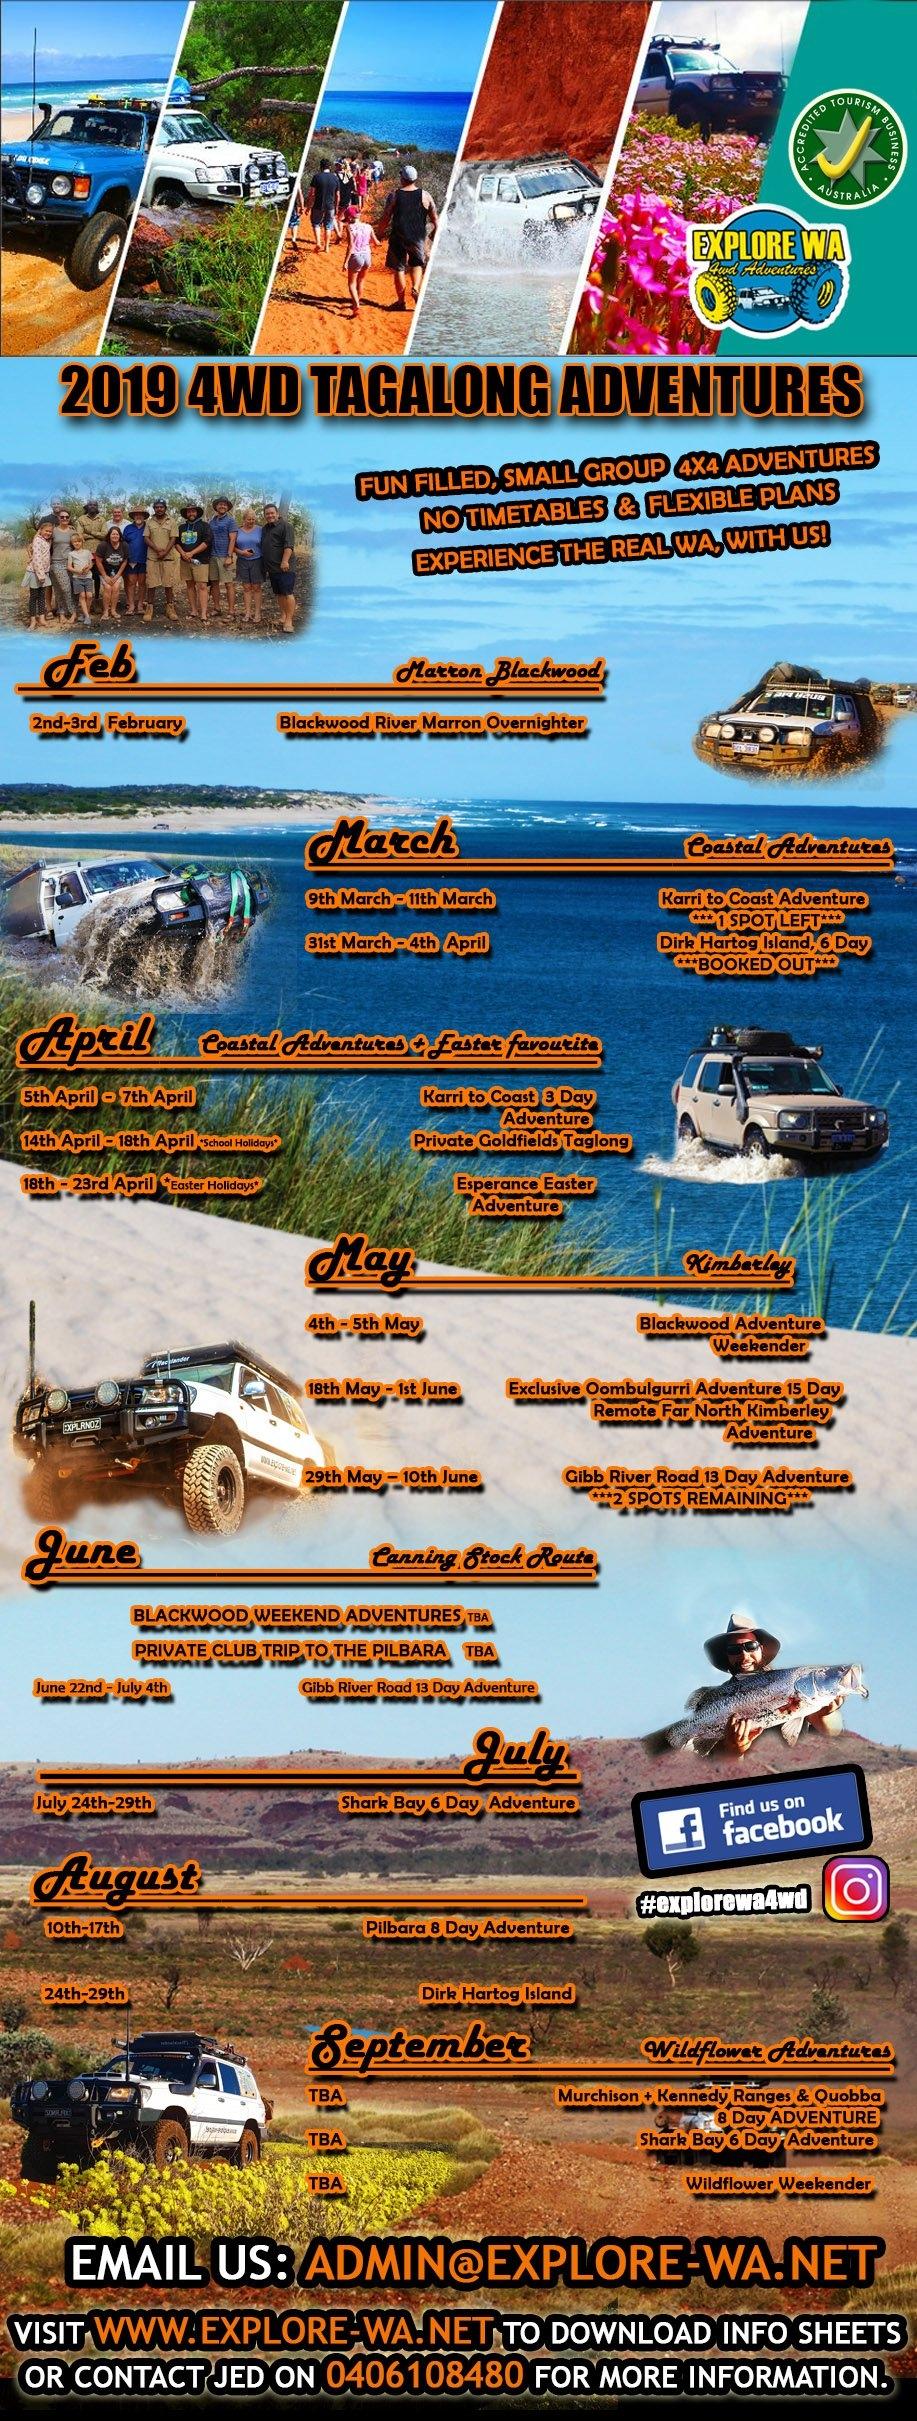 Karri To Coast 3 Day Tag A Long – Explore Wa 4Wd Calendar 2019